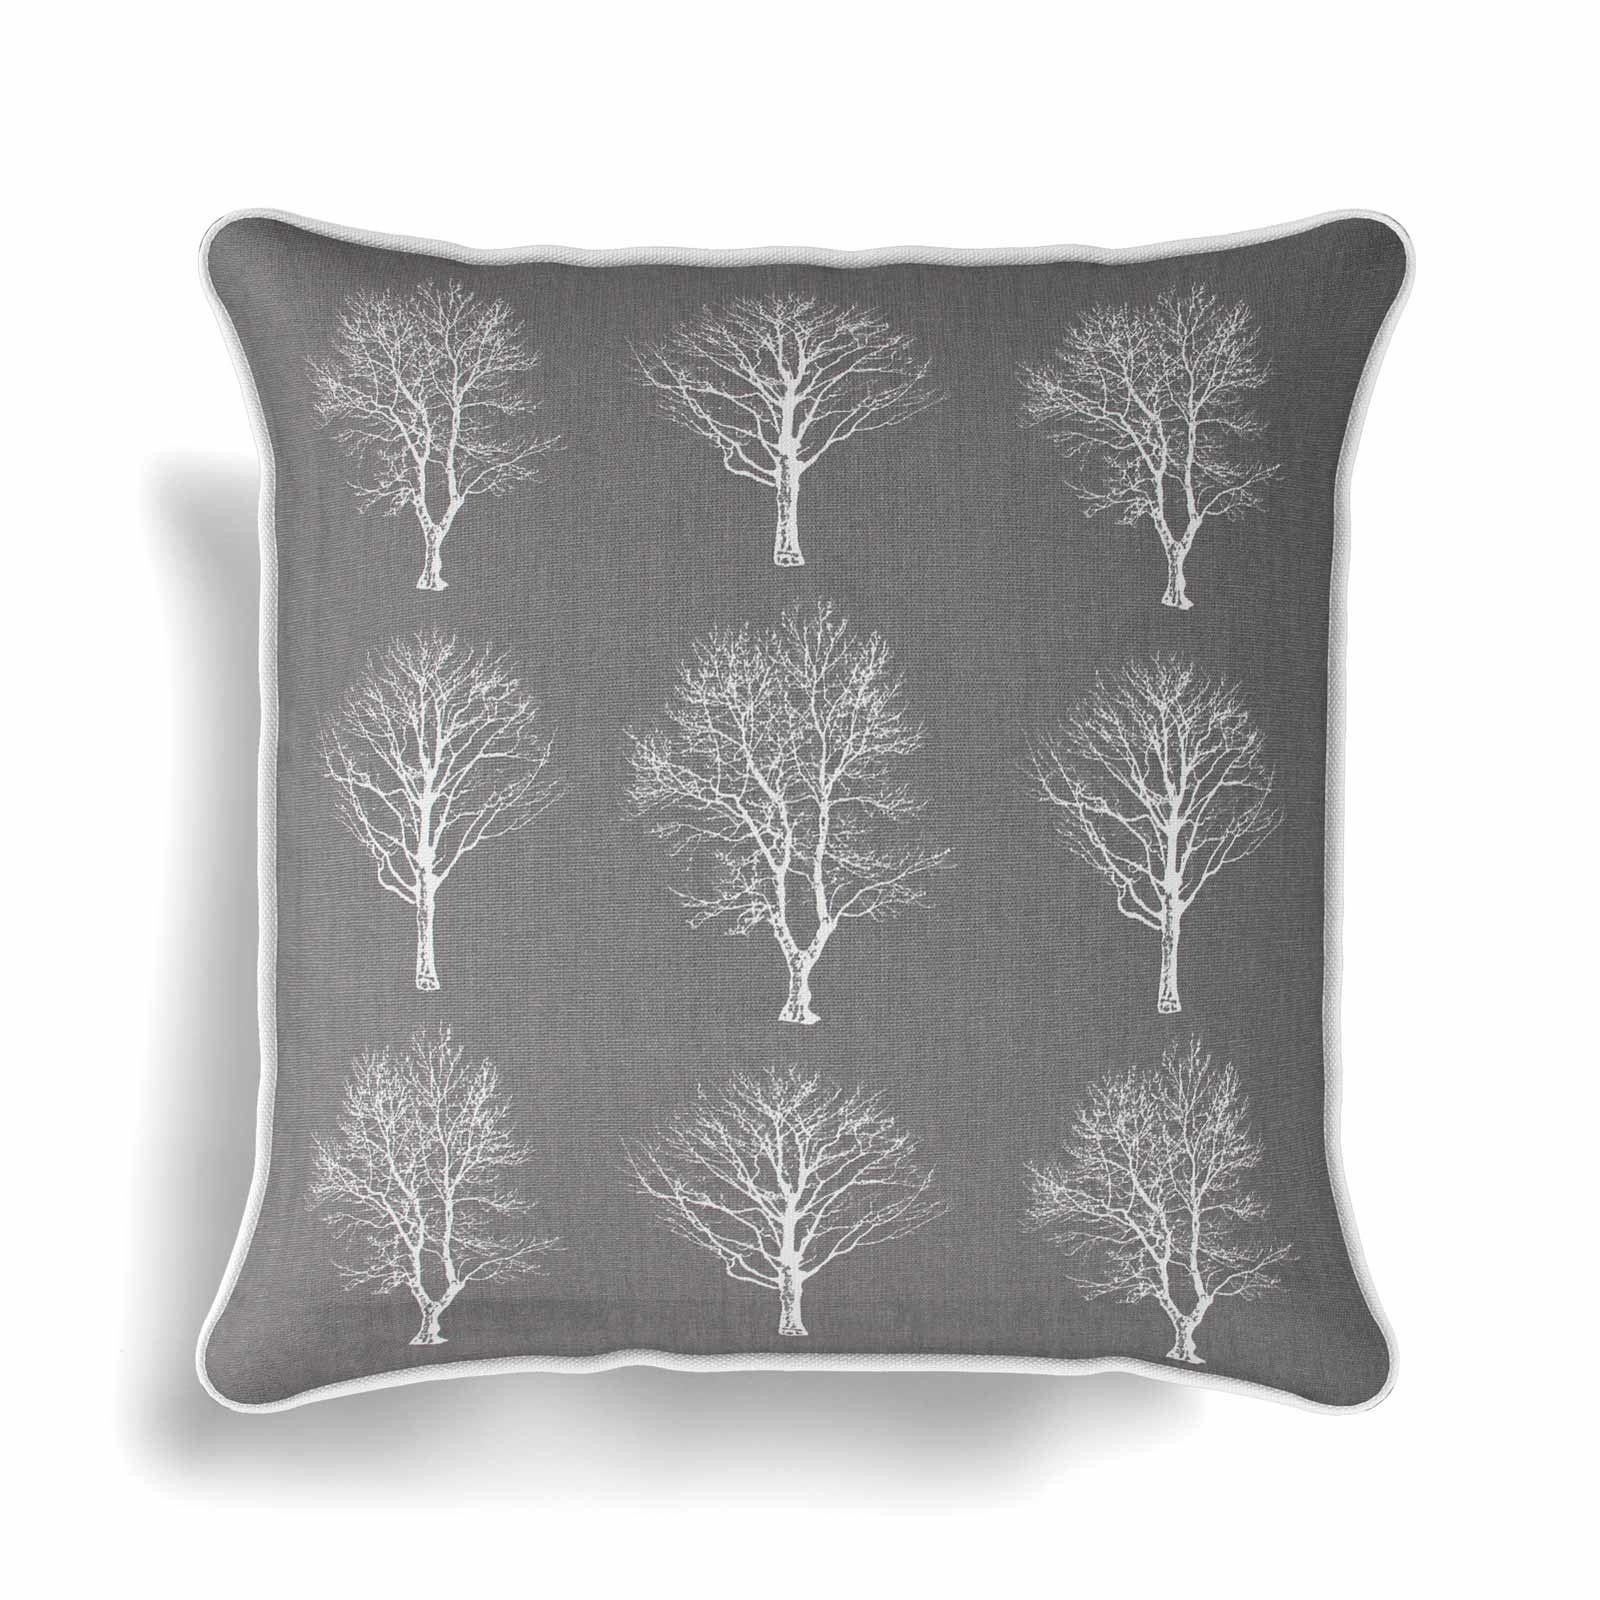 Woodland-Trees-Cushion-Cover-Modern-Reversible-Tree-Print-Covers-17-034-x-17-034 thumbnail 3